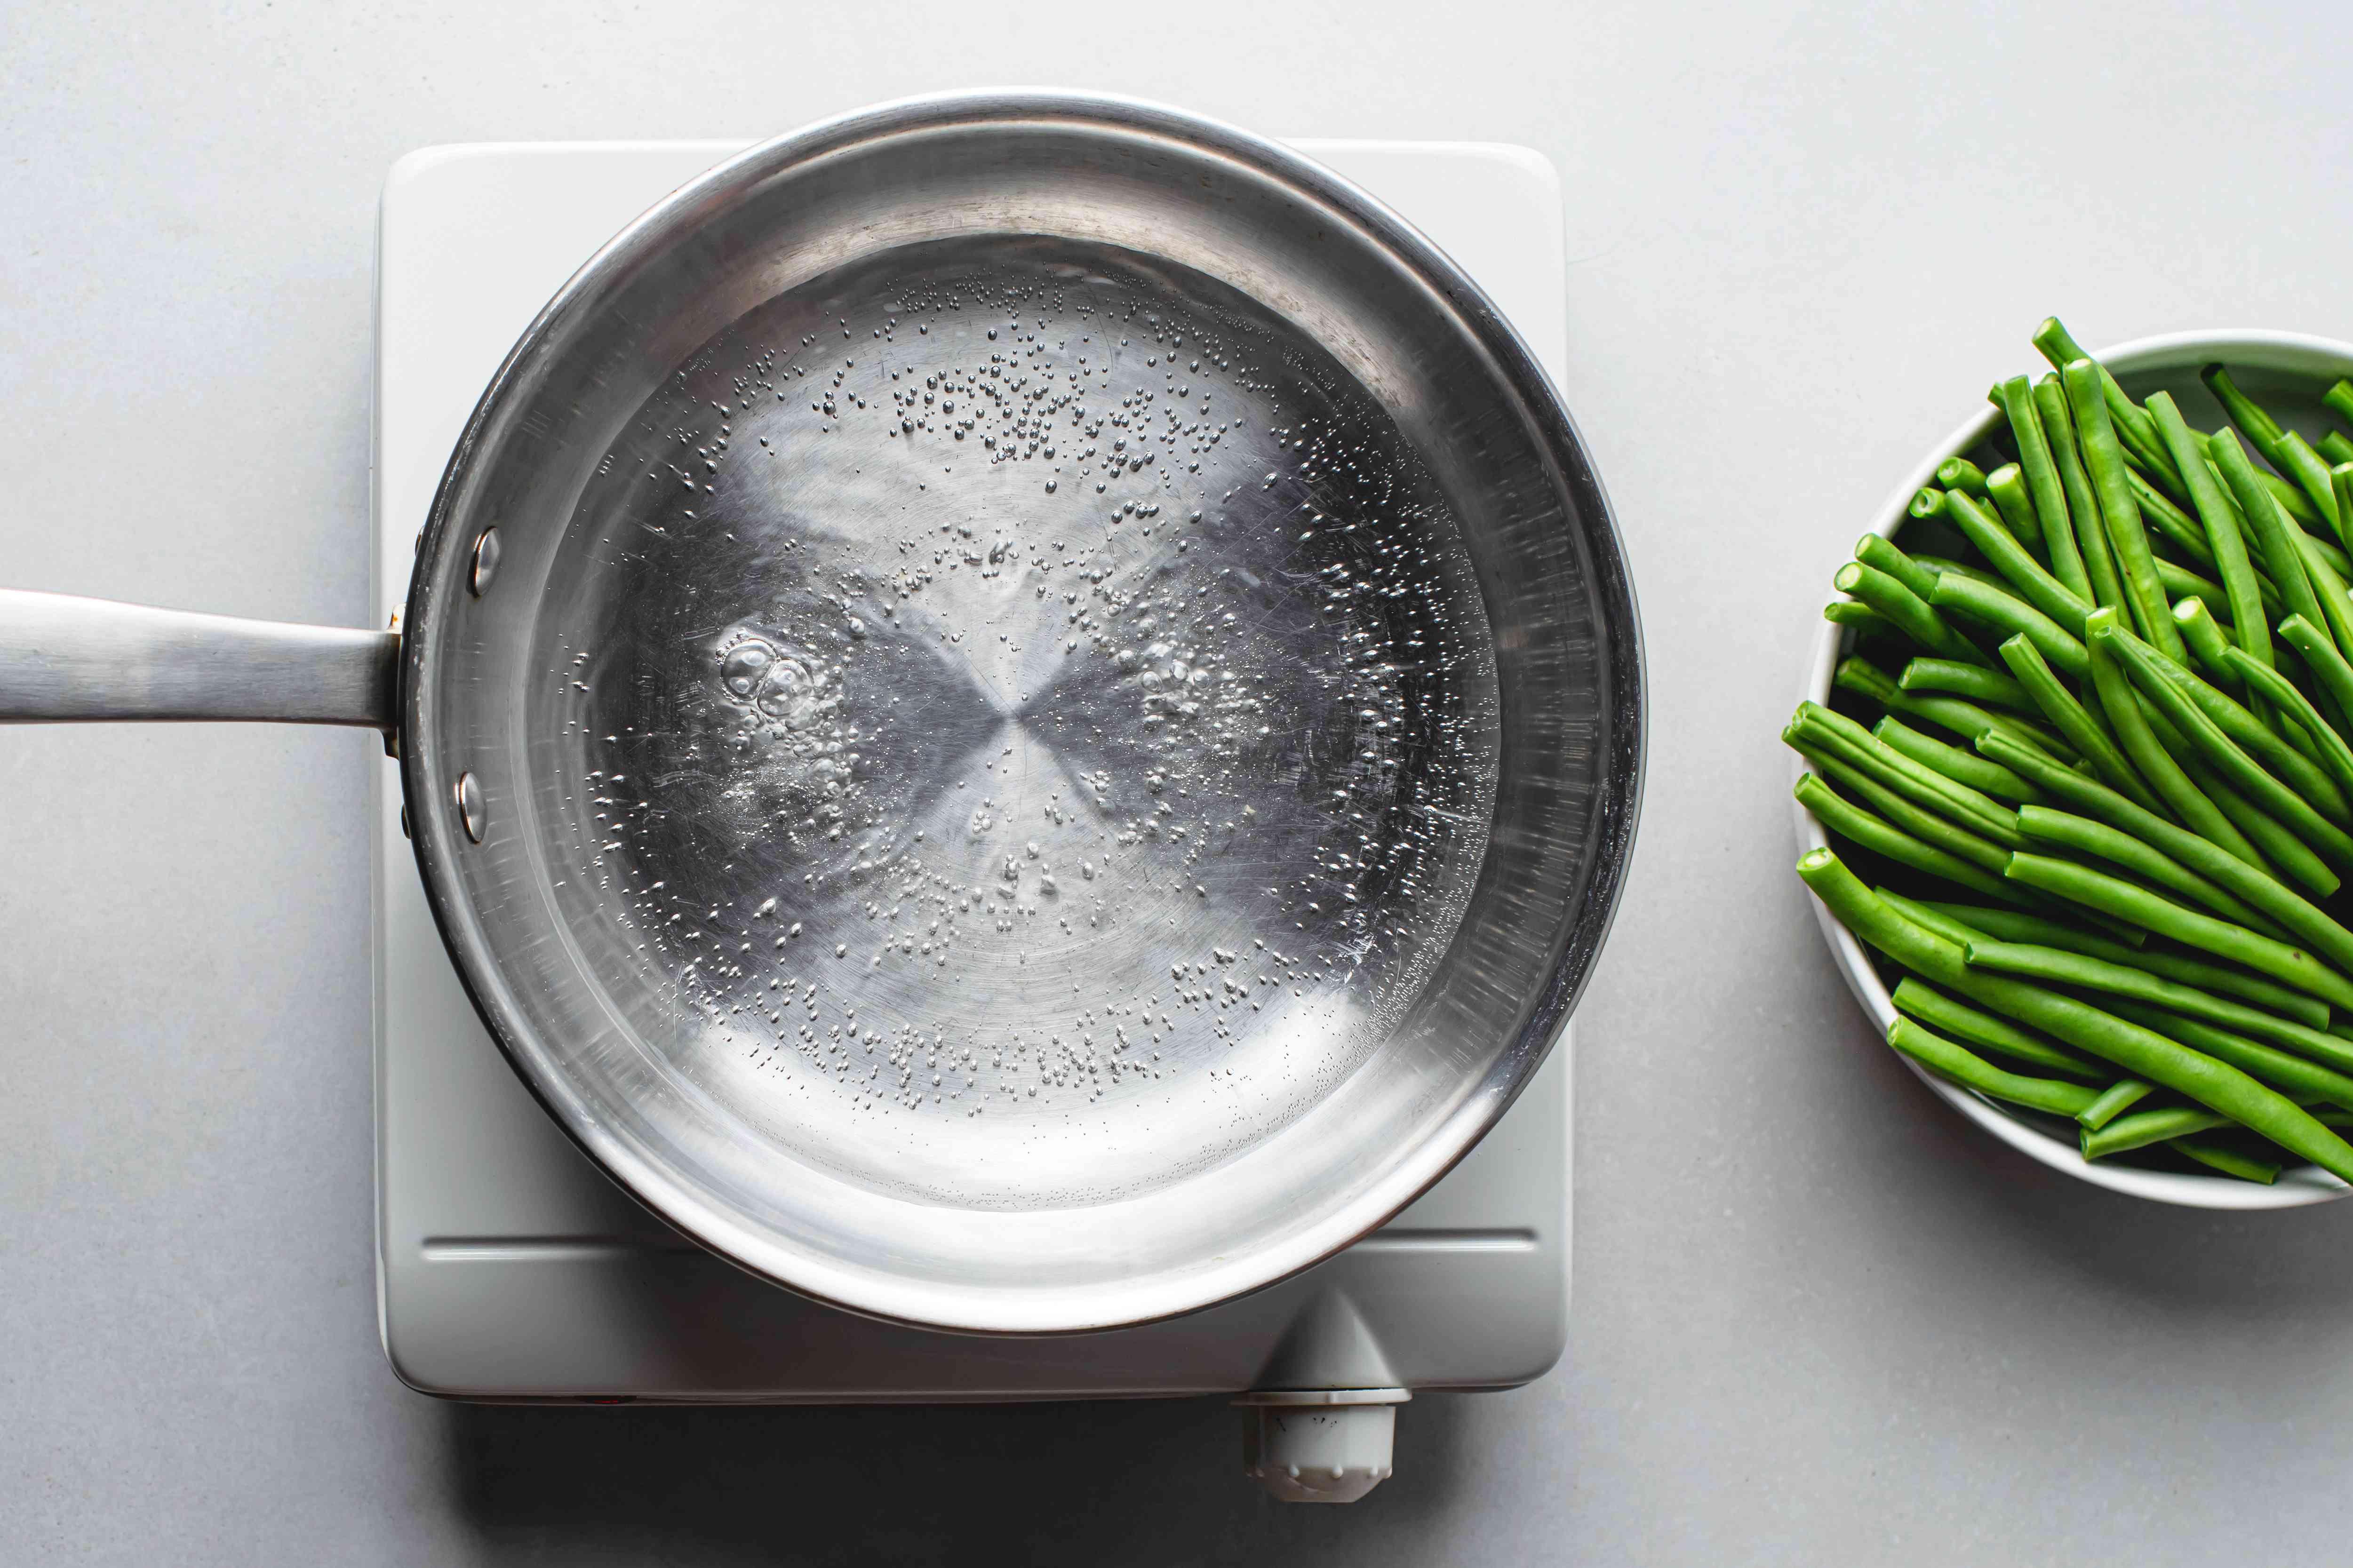 boiling water in a saucepan